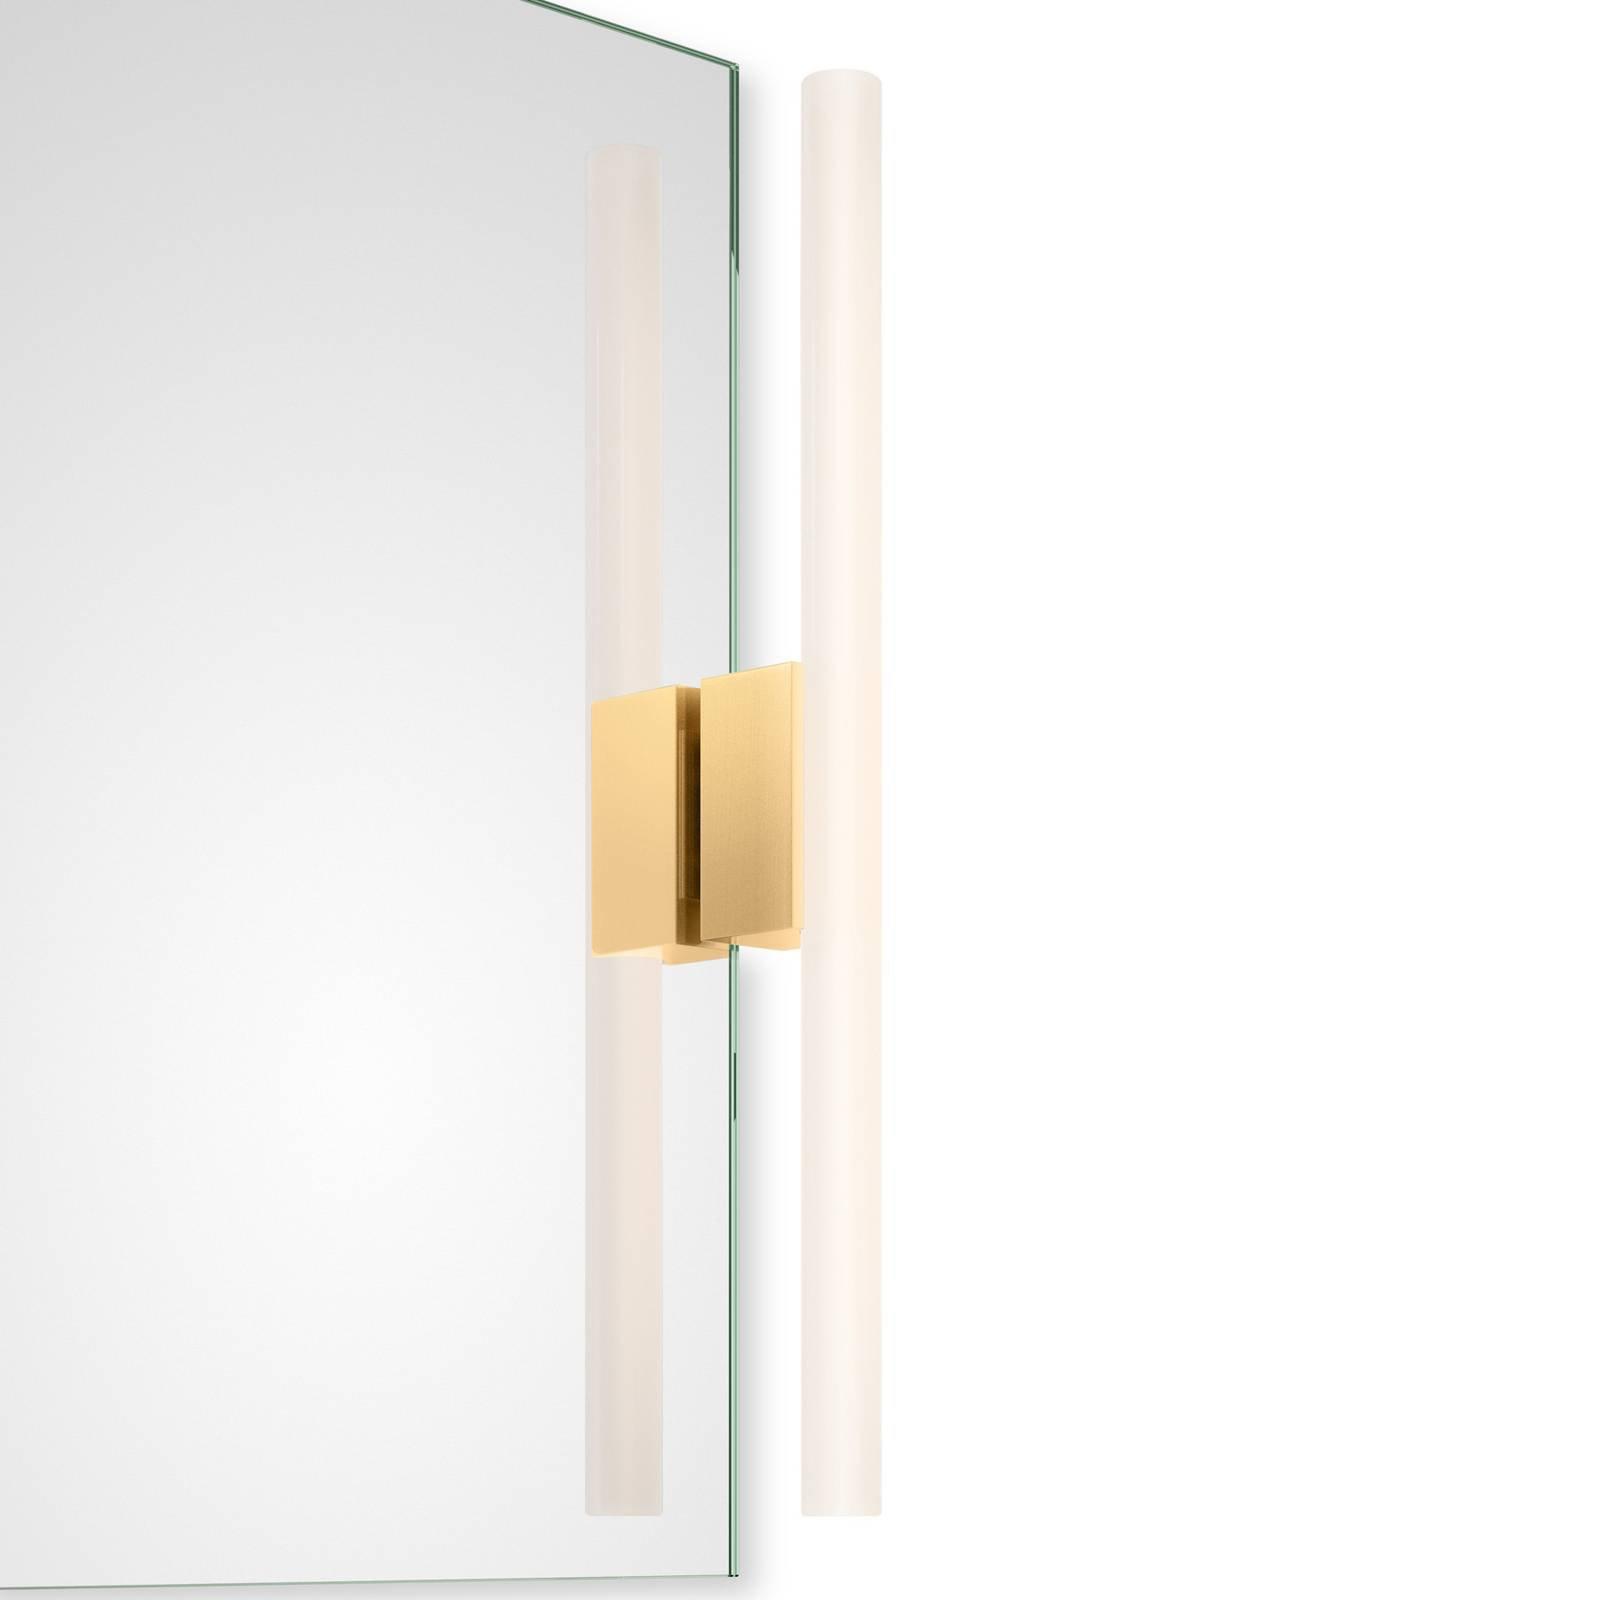 Decor Walther Omega 1 speillampe, gull matt